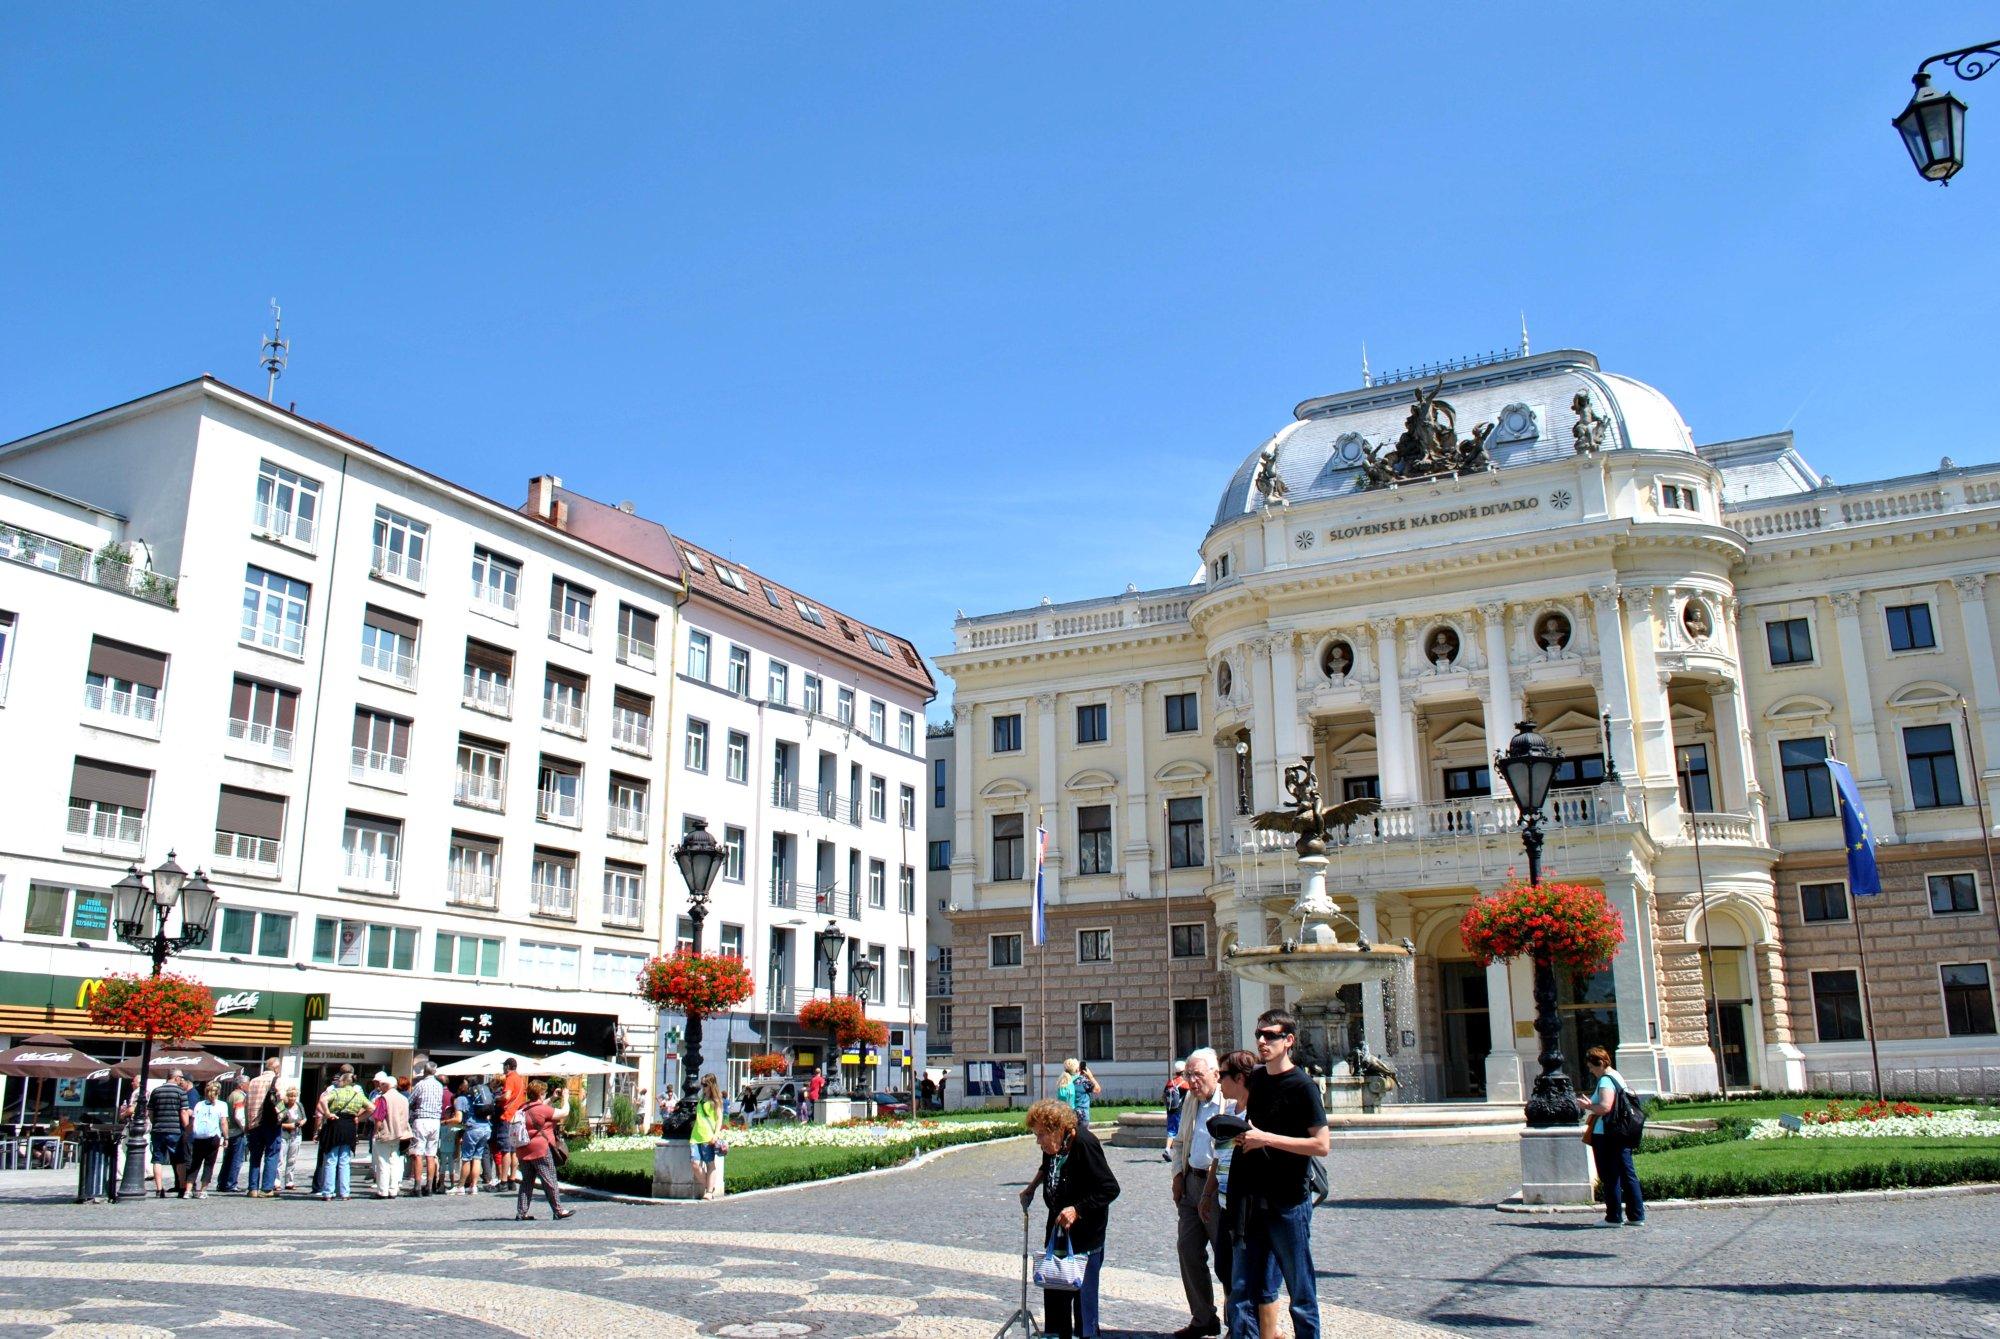 DSC 0171 Bratislava